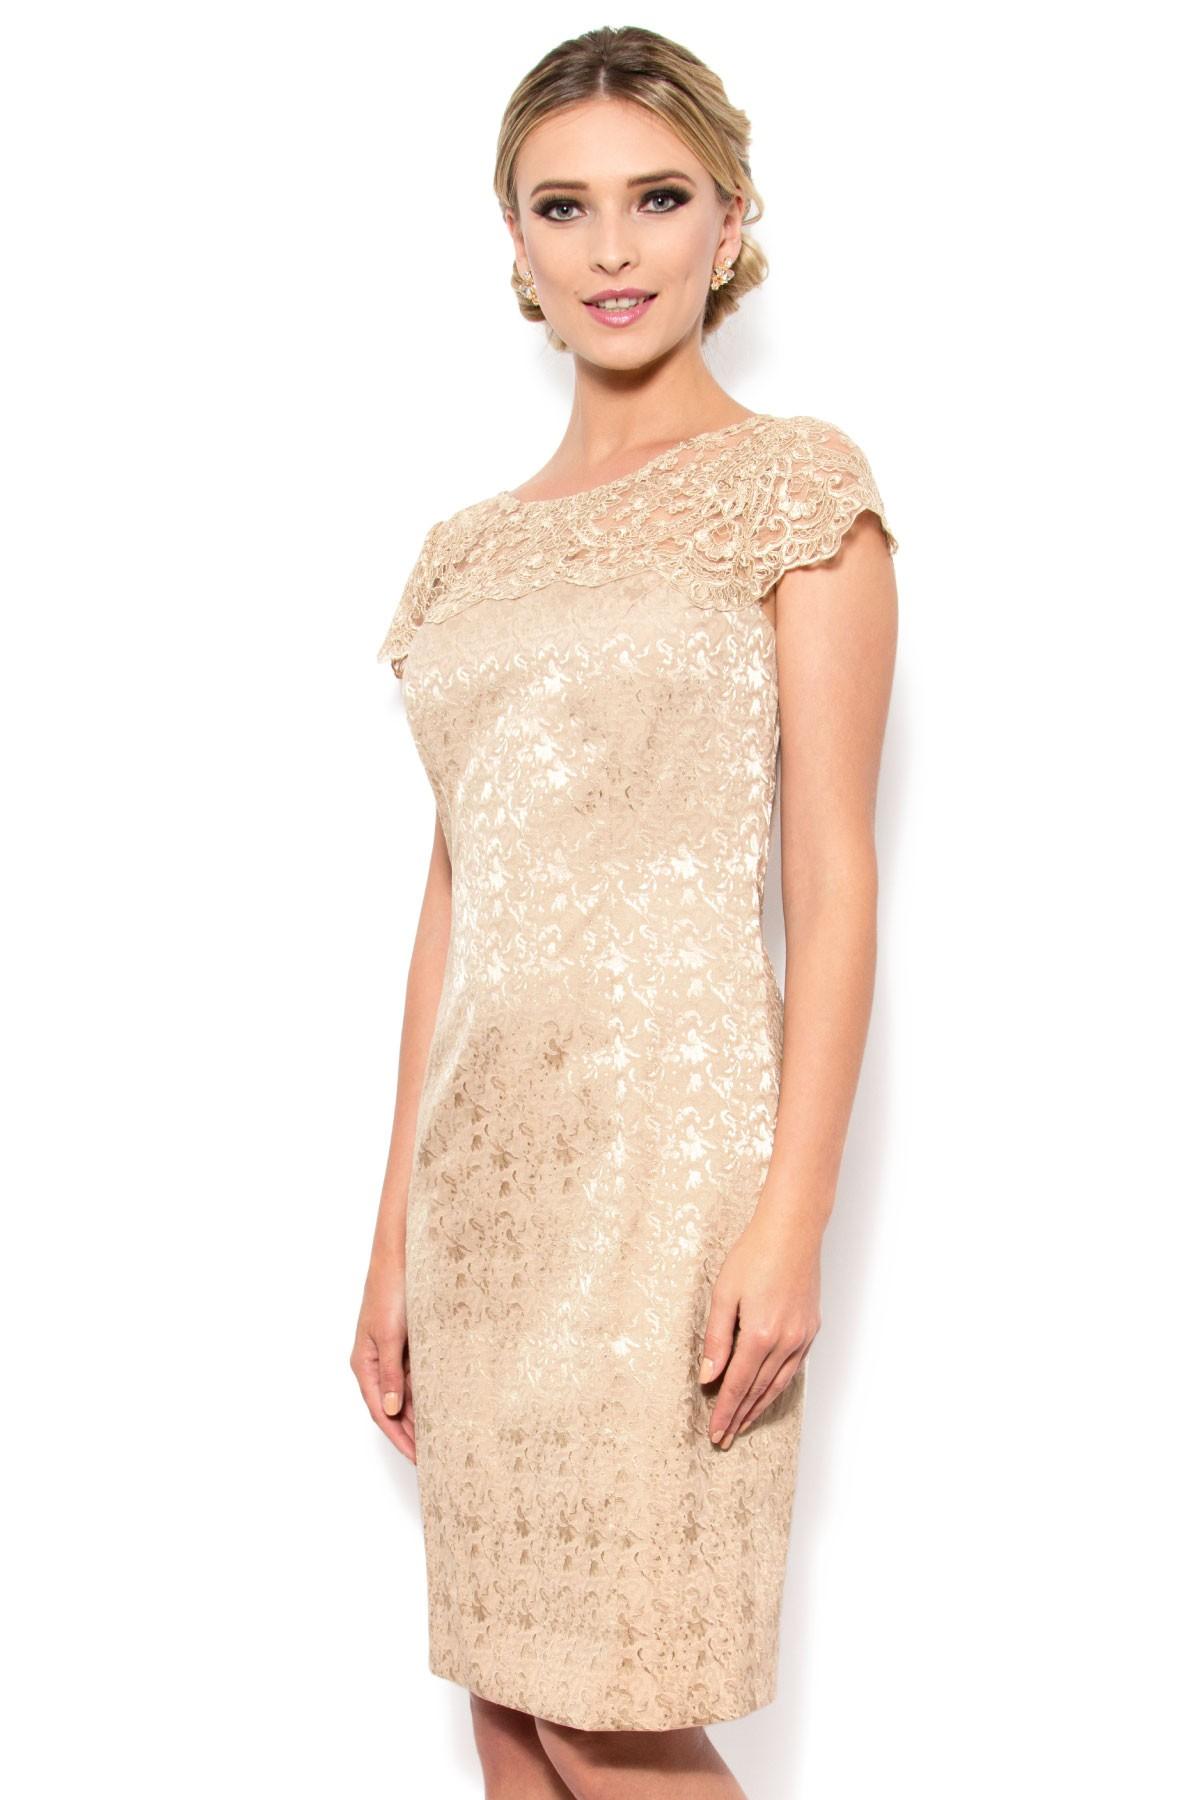 Modele Superbe De Rochii Online Poema Short Dresses For Women